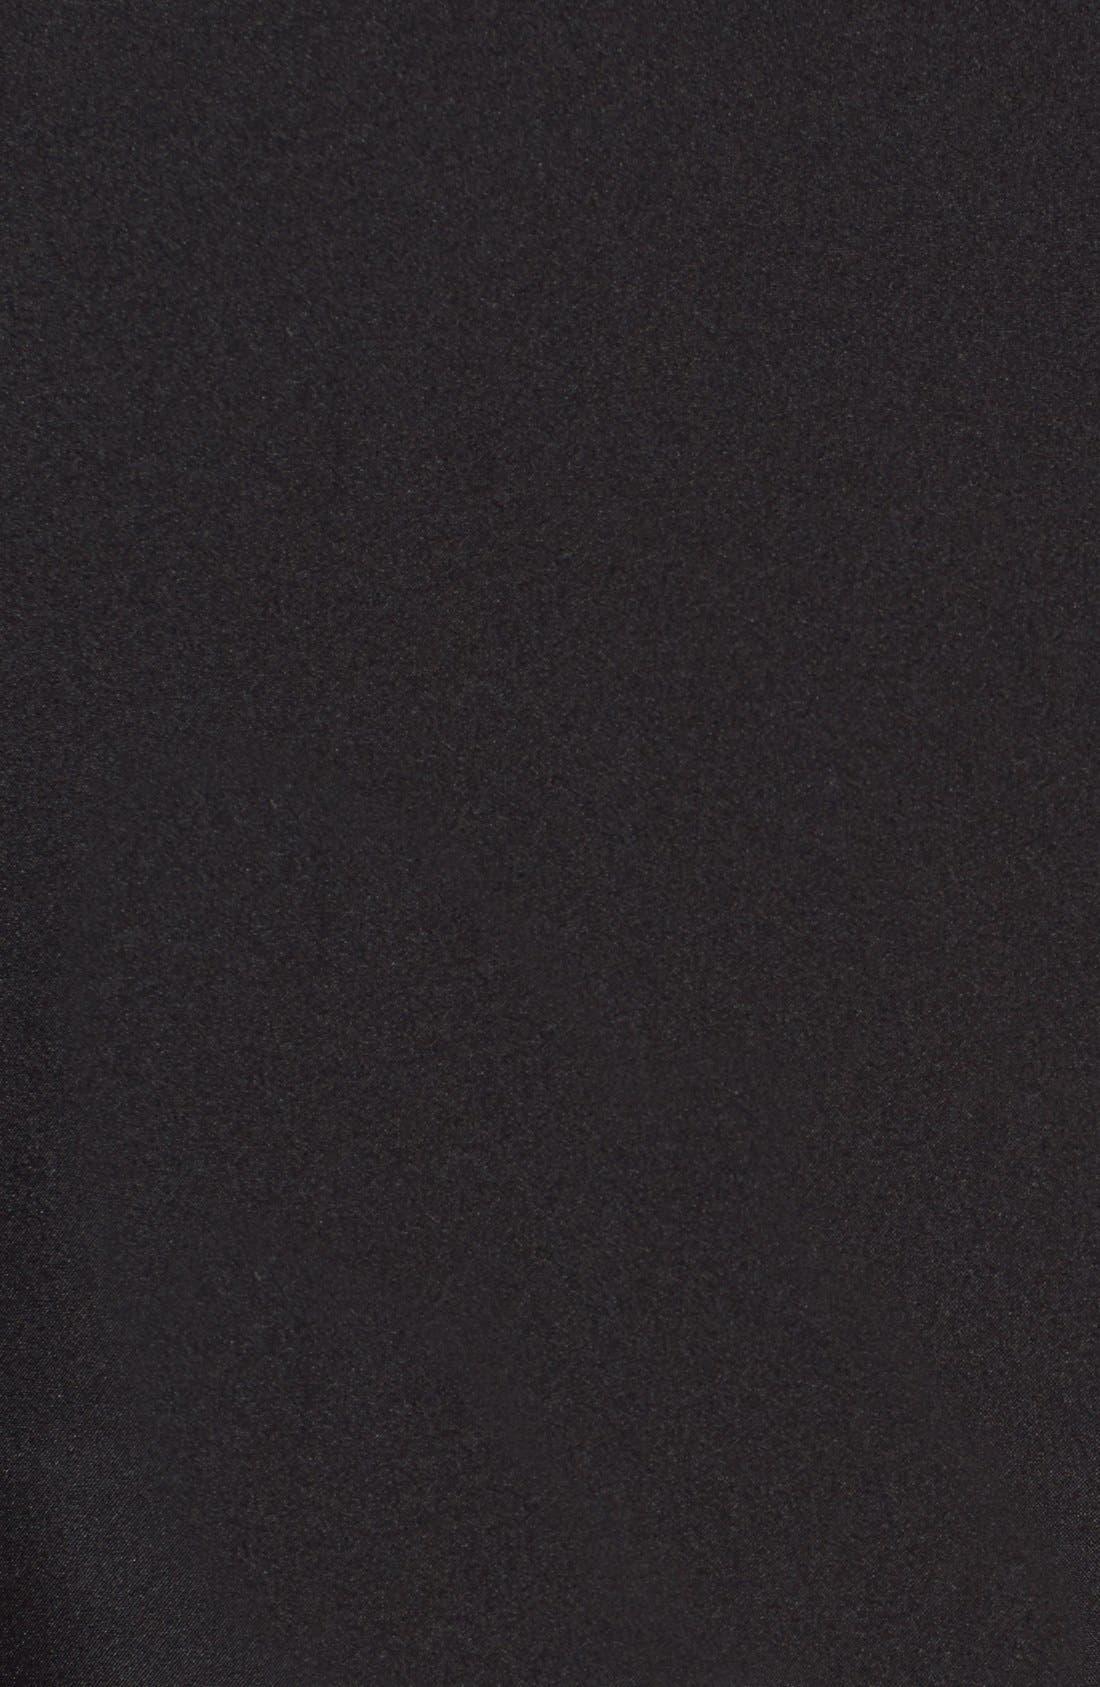 'WeatherTec Sanders' Jacket,                             Alternate thumbnail 3, color,                             001